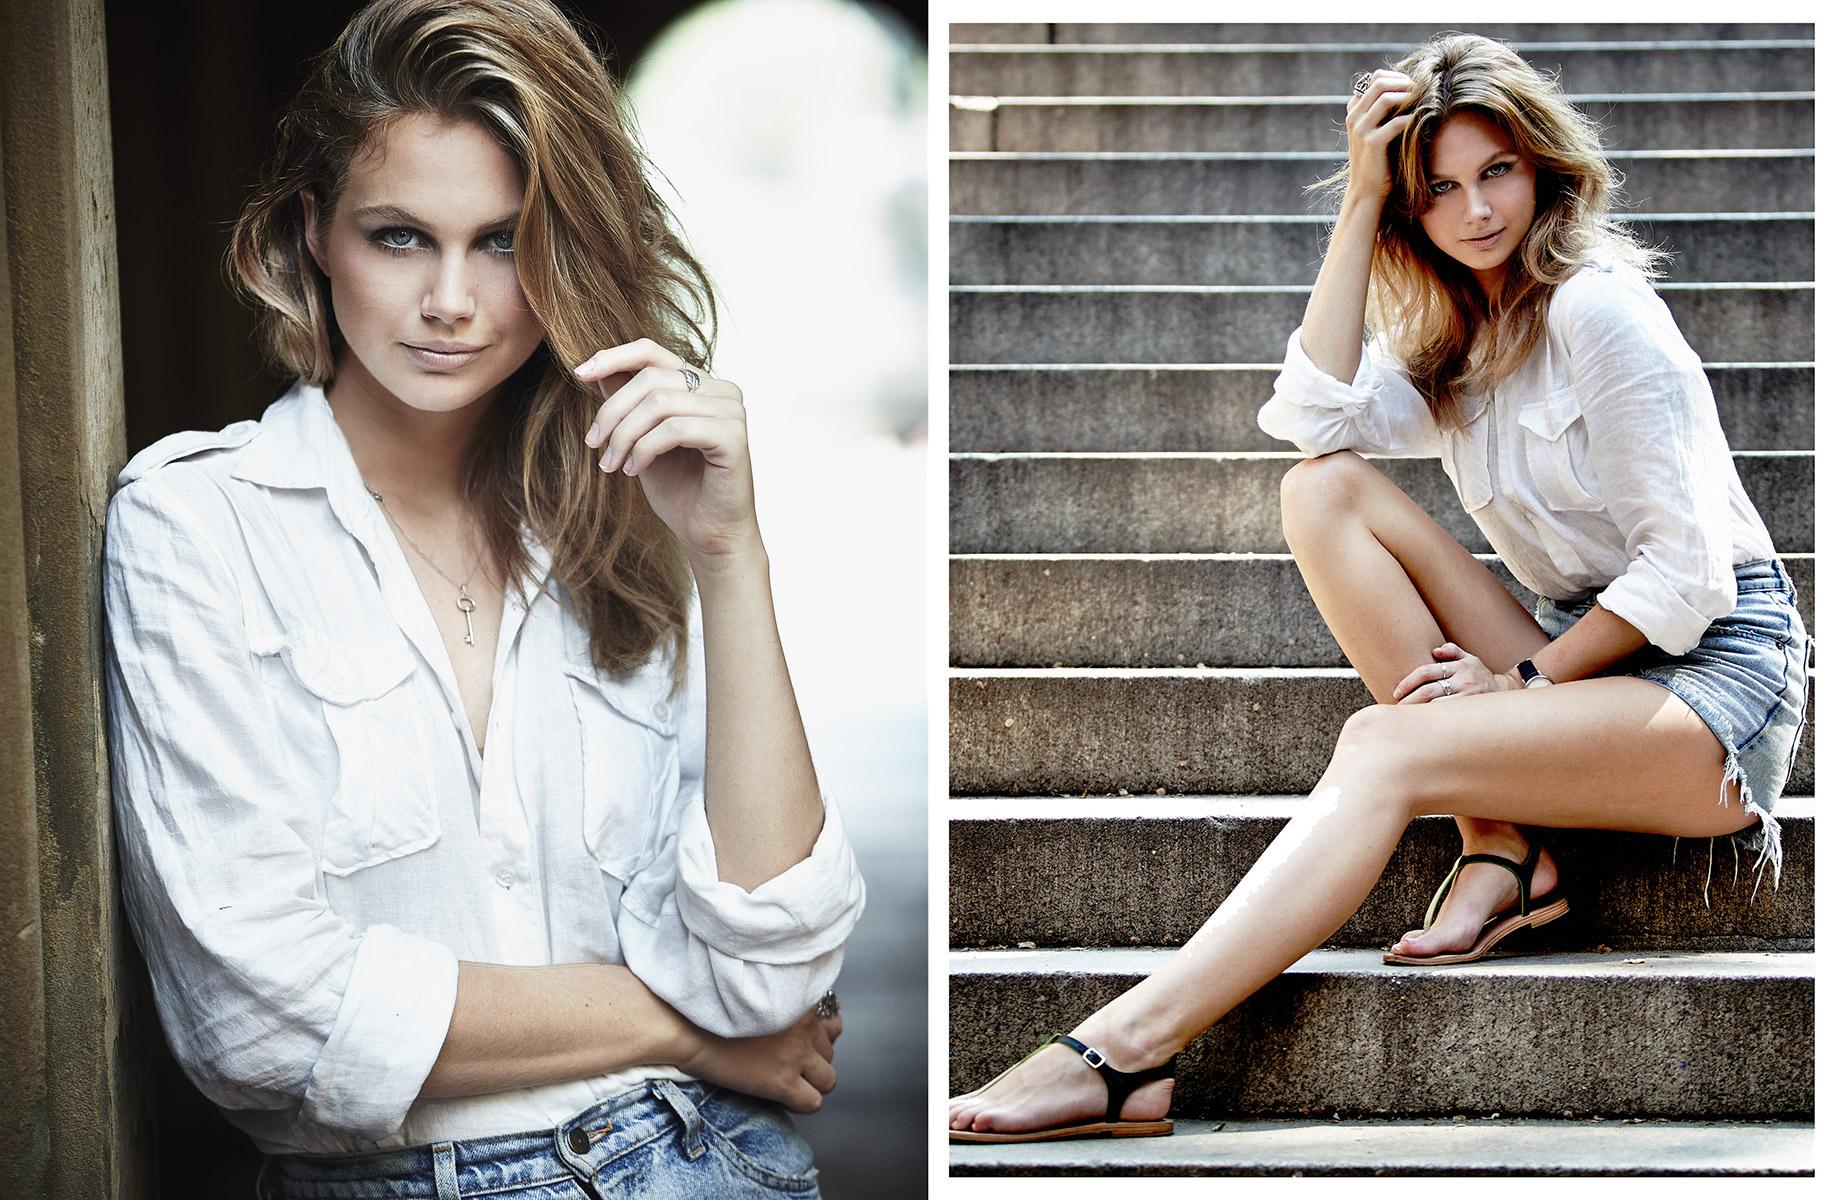 Ksenija, NEXT Models, NYC